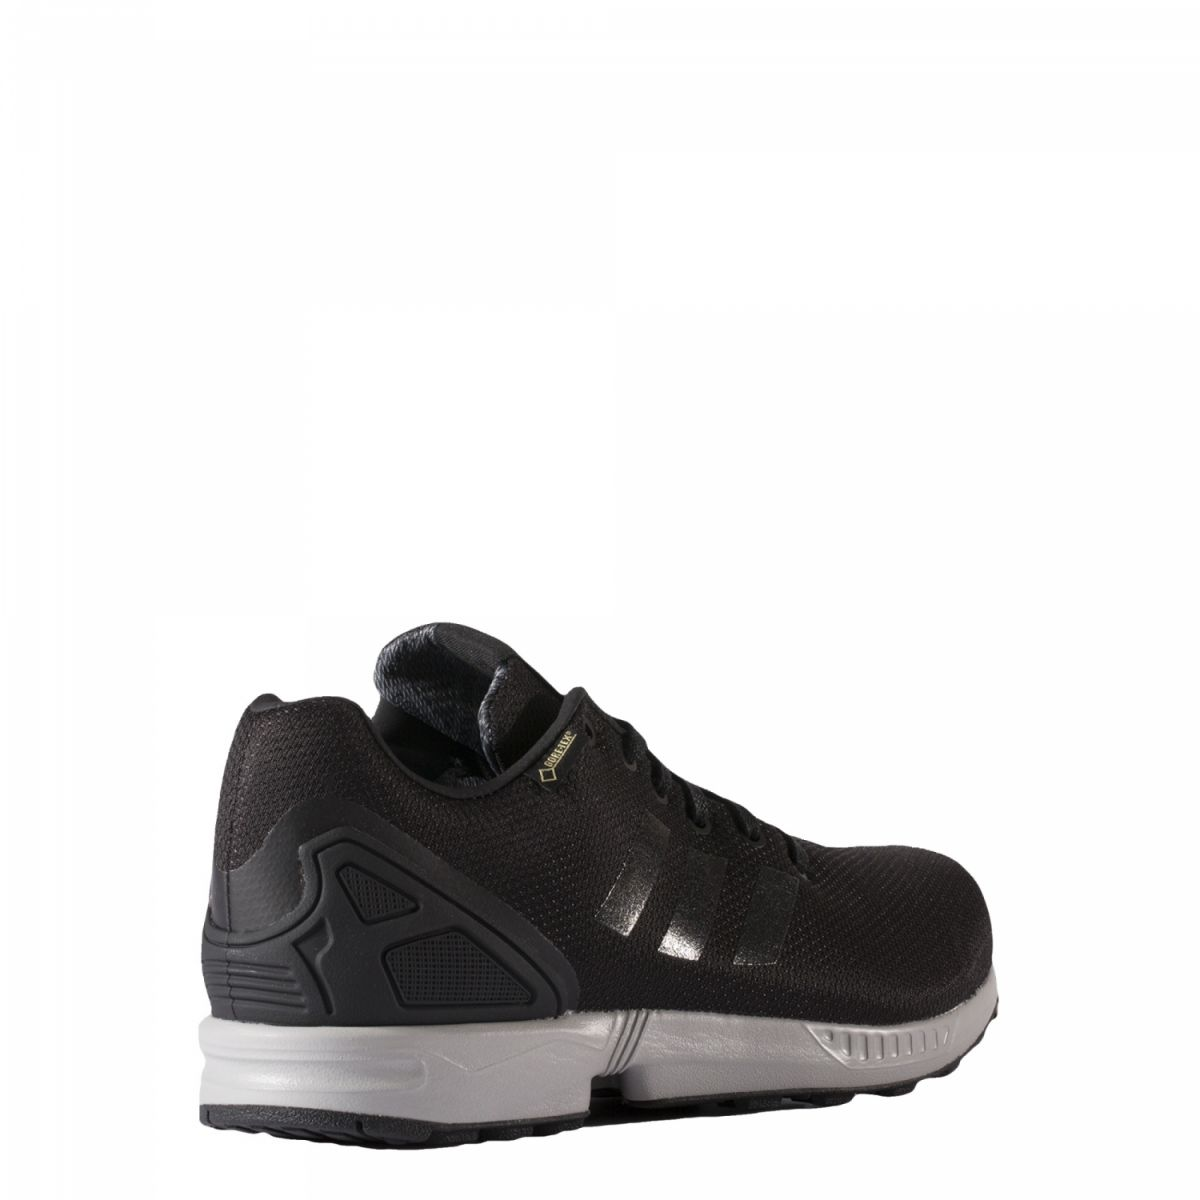 sport klingenmaier adidas originals zx flux gtx sneaker herren schwarz grau online kaufen. Black Bedroom Furniture Sets. Home Design Ideas